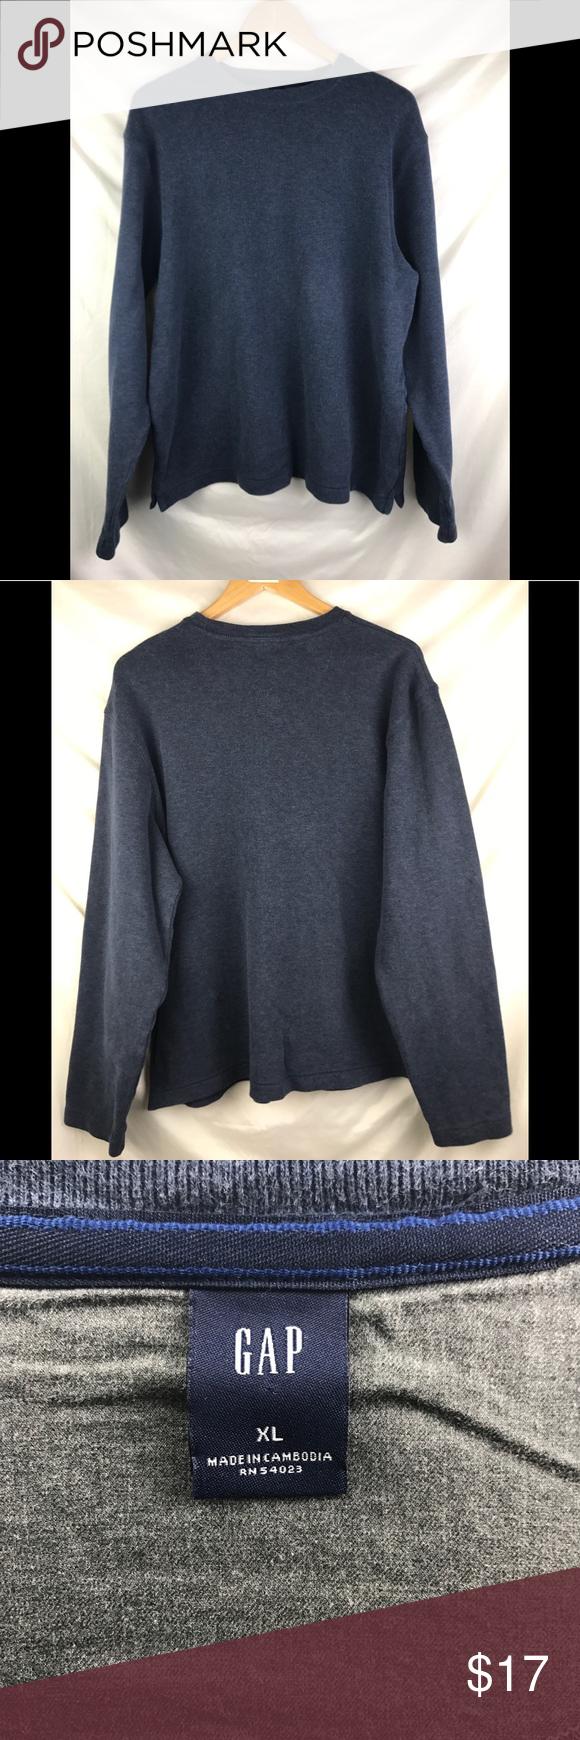 Gap Men S Sweater Xtra Large Crewneck Xl Sweaters Men Sweater Clothes Design [ 1740 x 580 Pixel ]